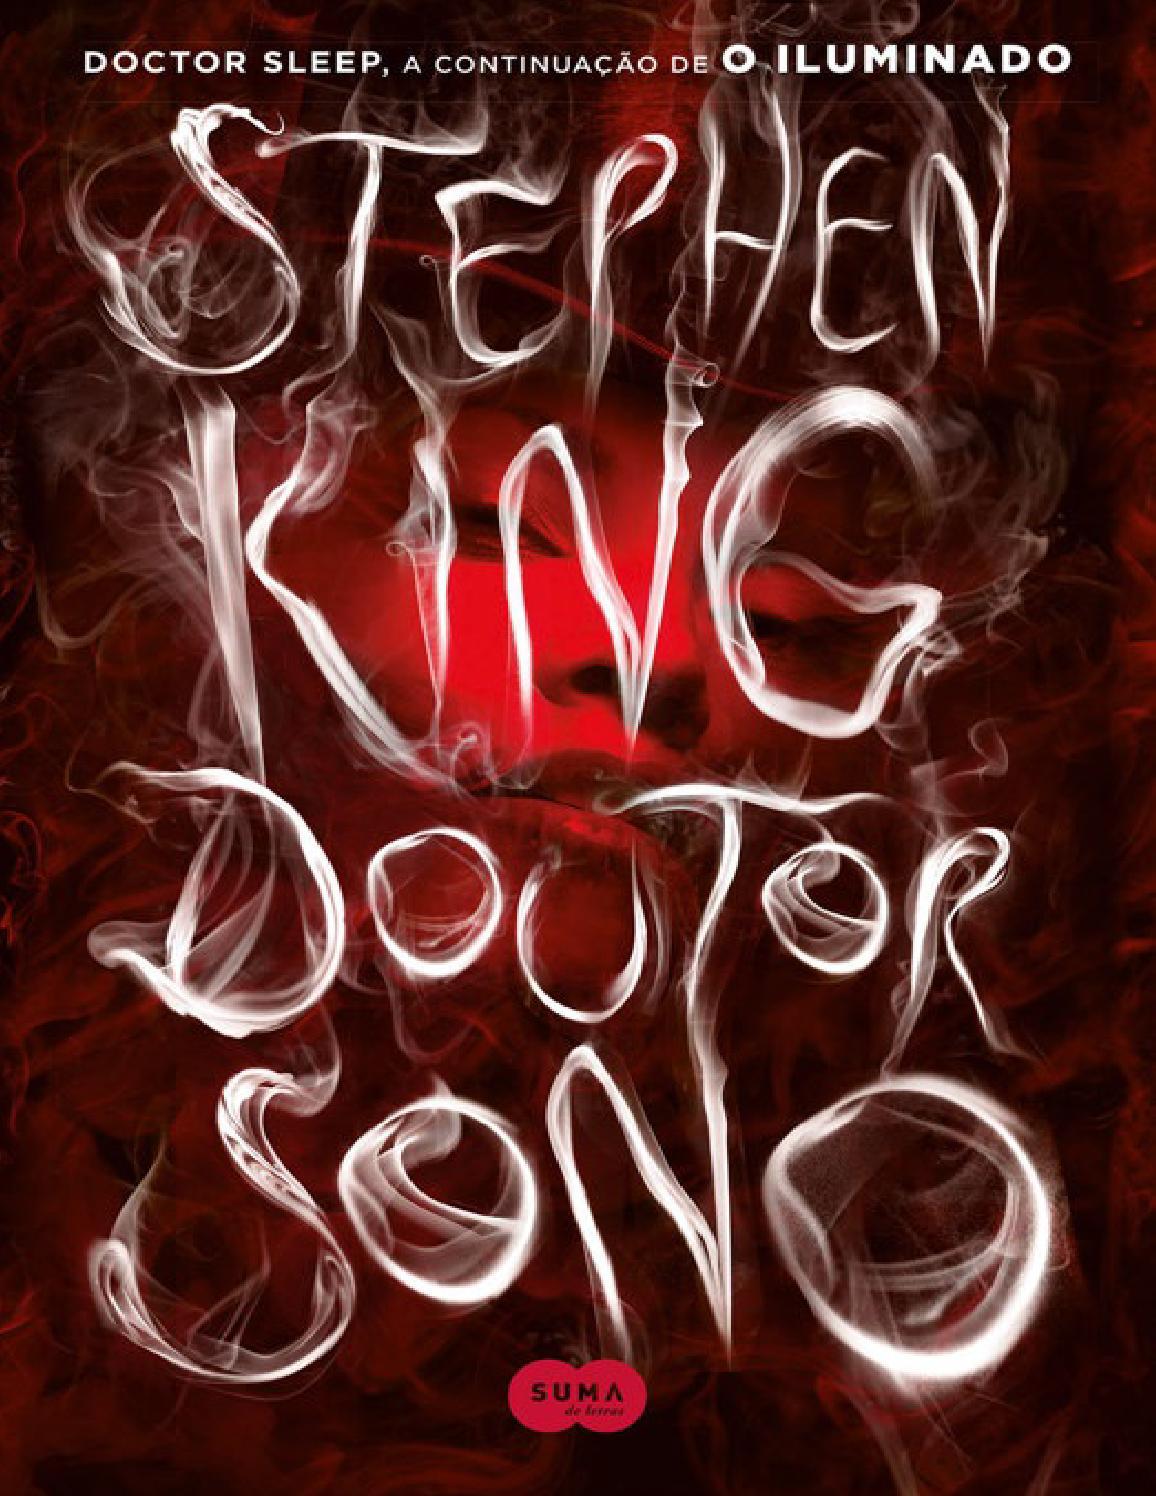 Doutor sono stephen king by Maria - issuu 725fc2960b7